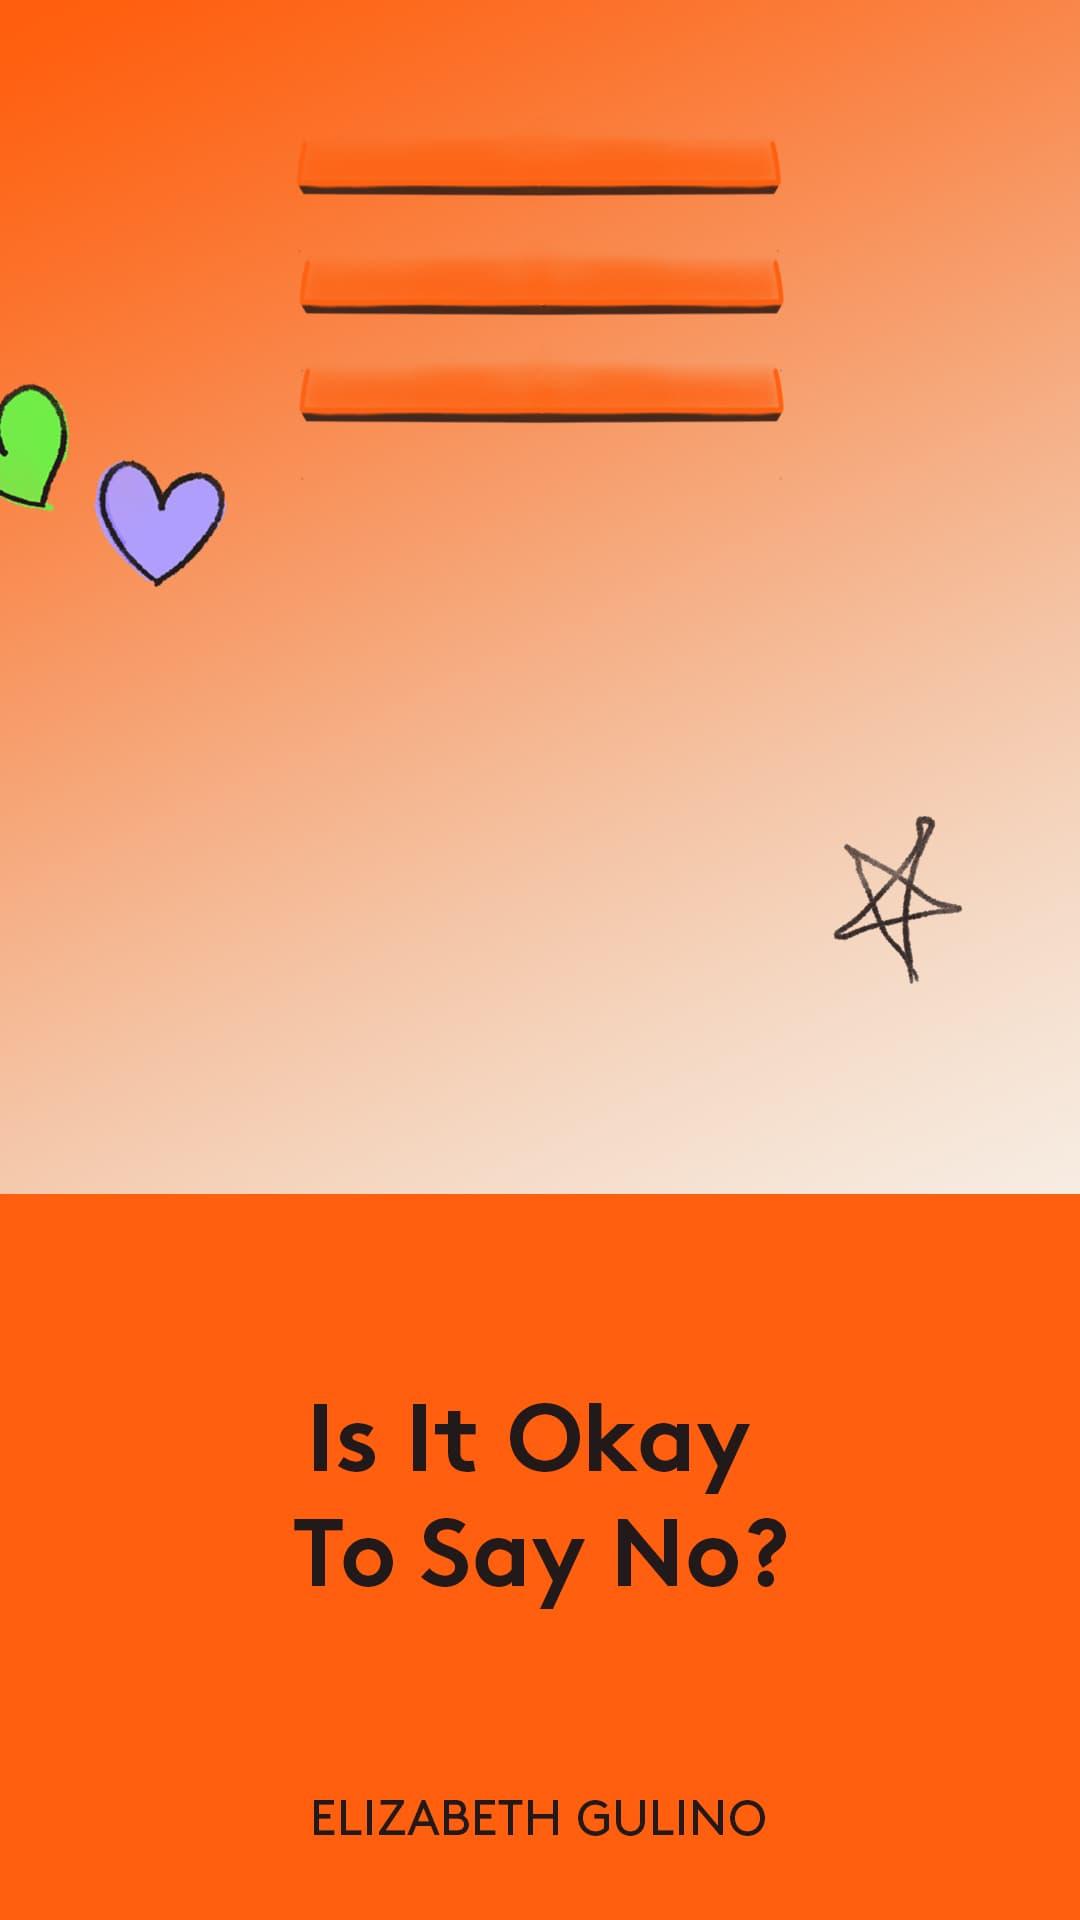 Is it okay to say no? By ELizabeth Gulino.